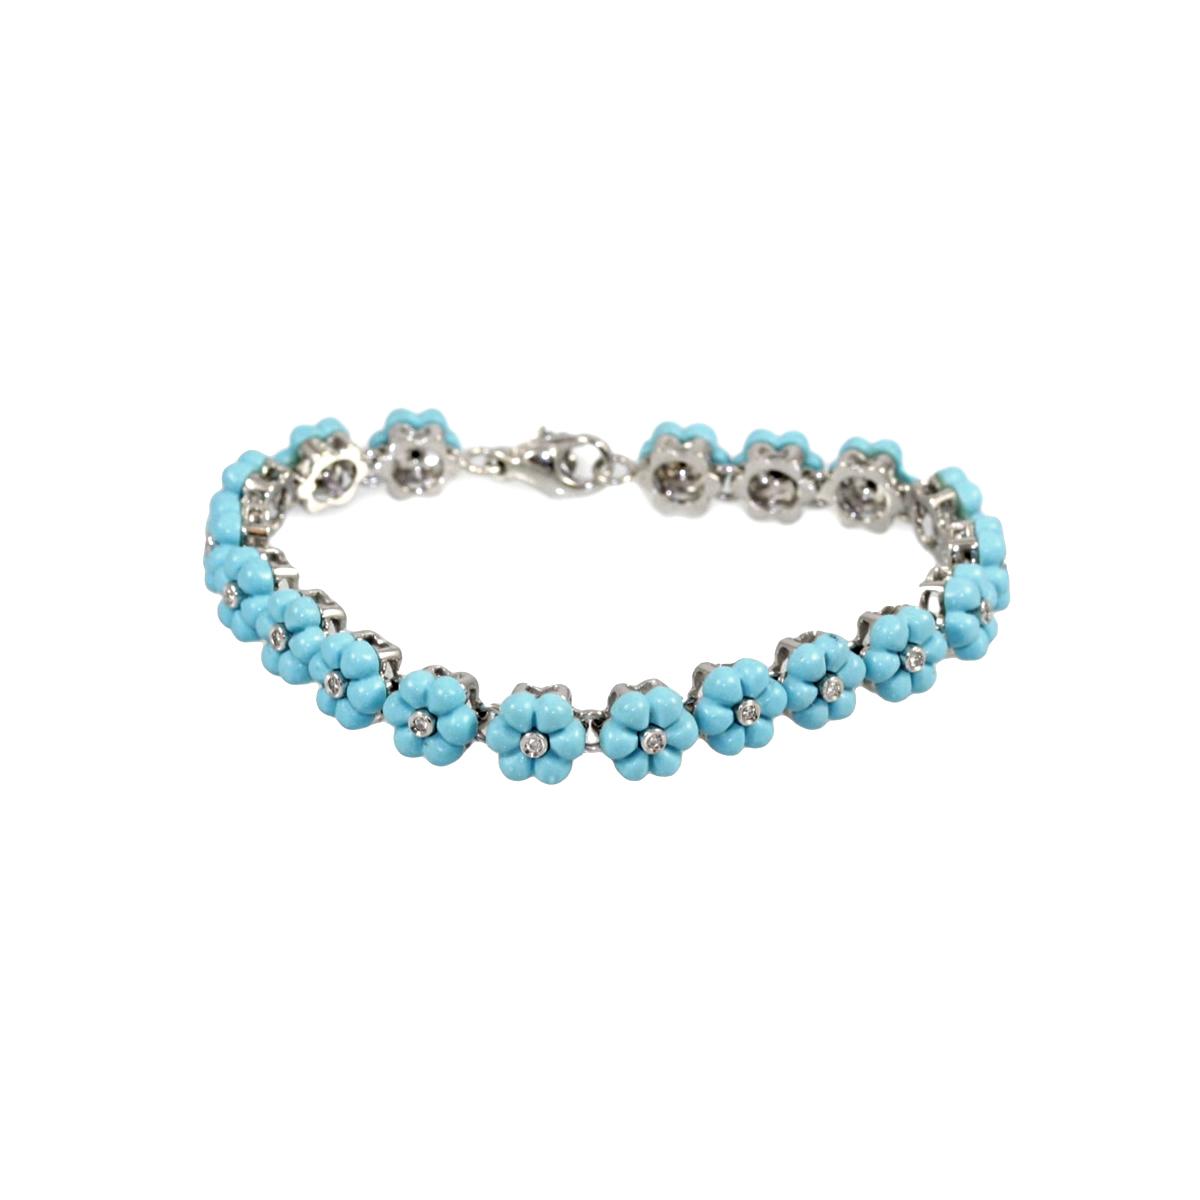 Vintage 18 Karat White Gold Turquoise and Diamond Bracelet